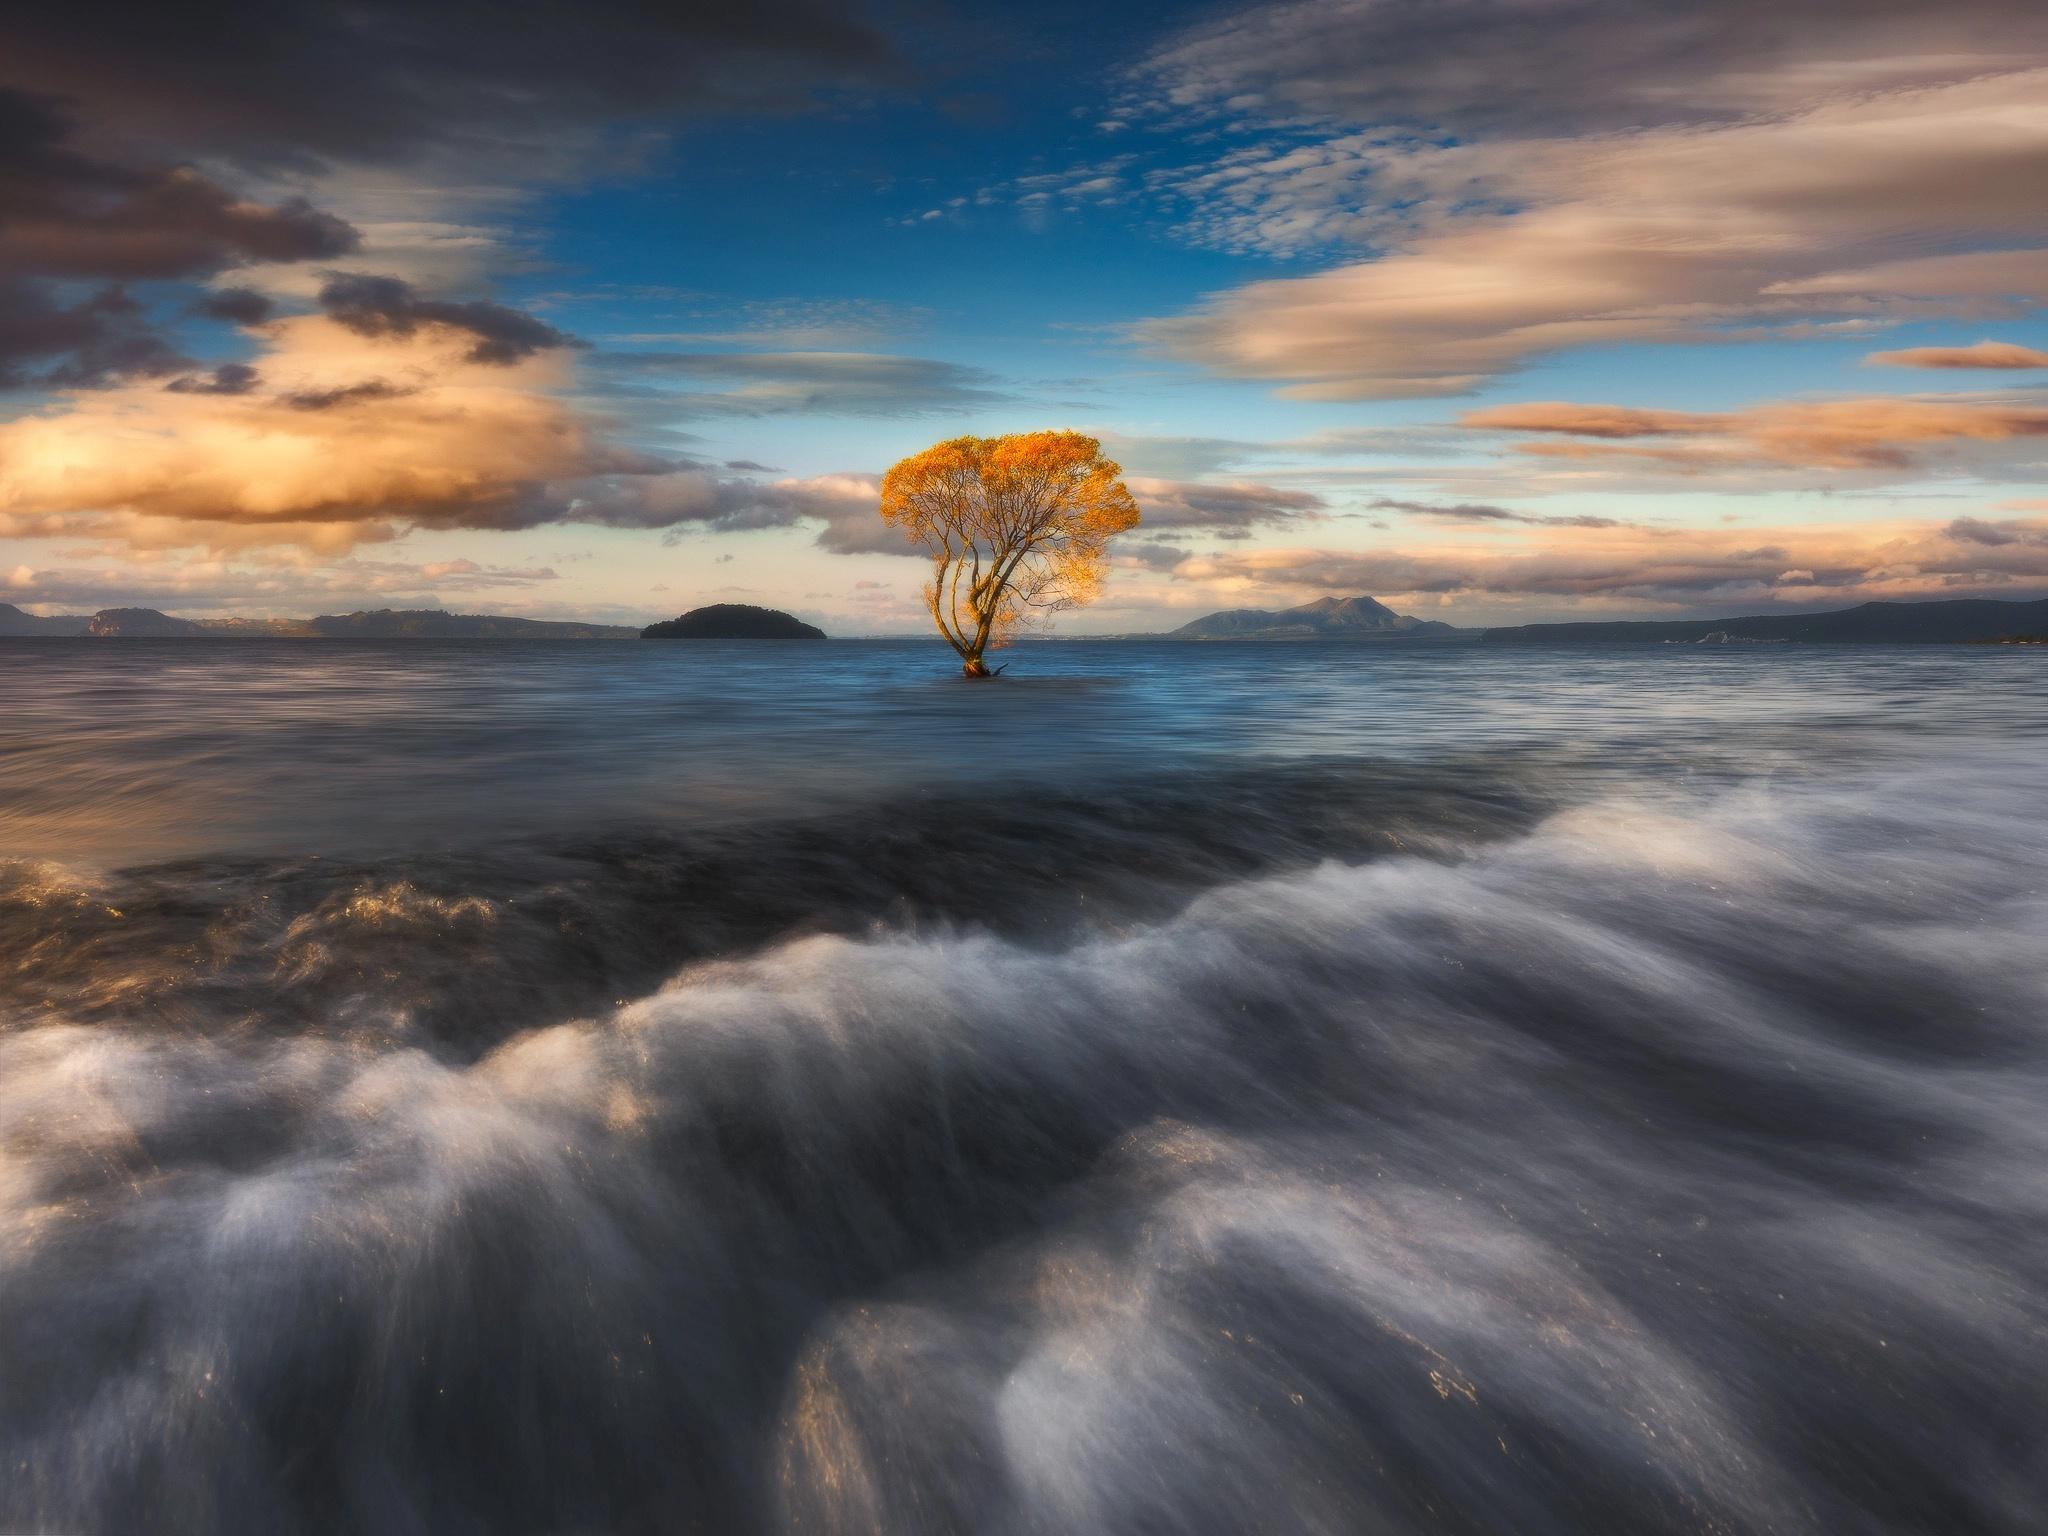 Ocean Nature Sky Cloud Horizon 2048x1536